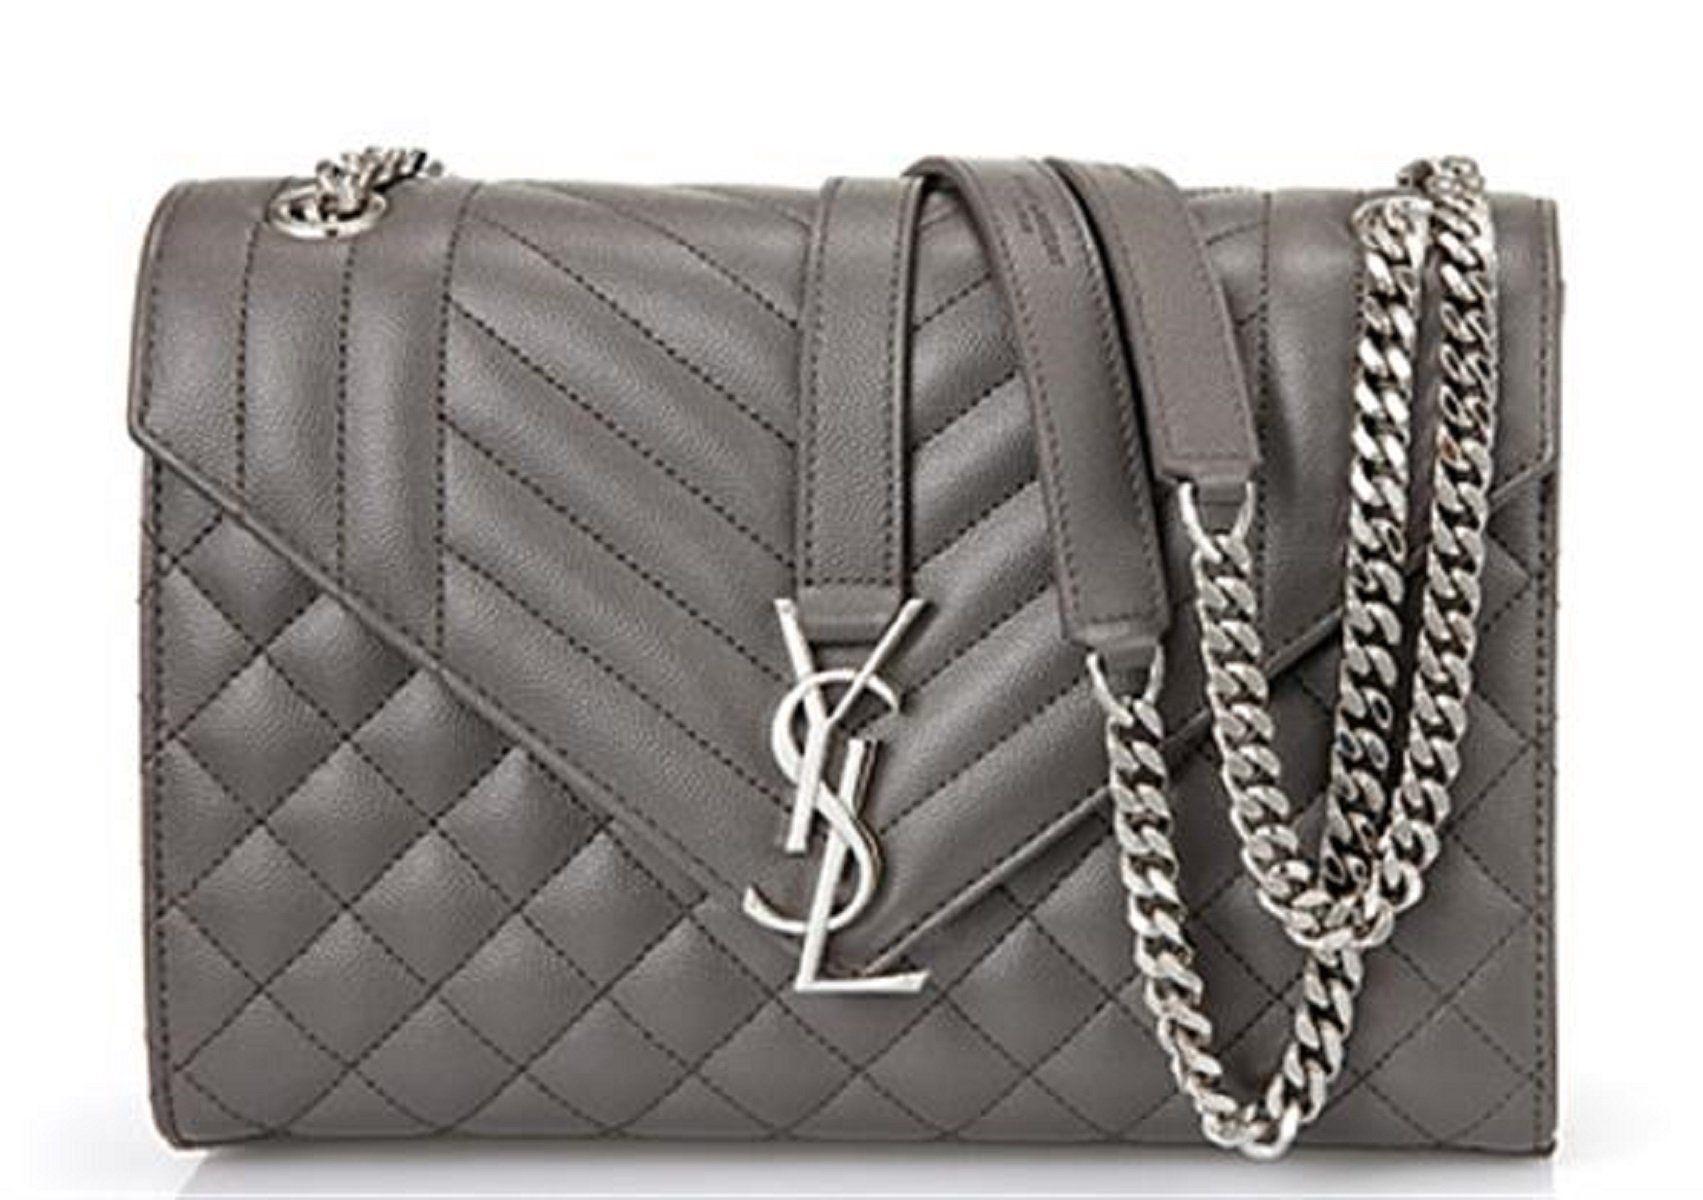 227fd32086ef Saint Laurent YSL Women s Earth Gray with Silver Hardware Medium Envelope  Chain Shoulder Bag 428134  Designer  DesignerHandbags  BeverlyHills   Fashion ...